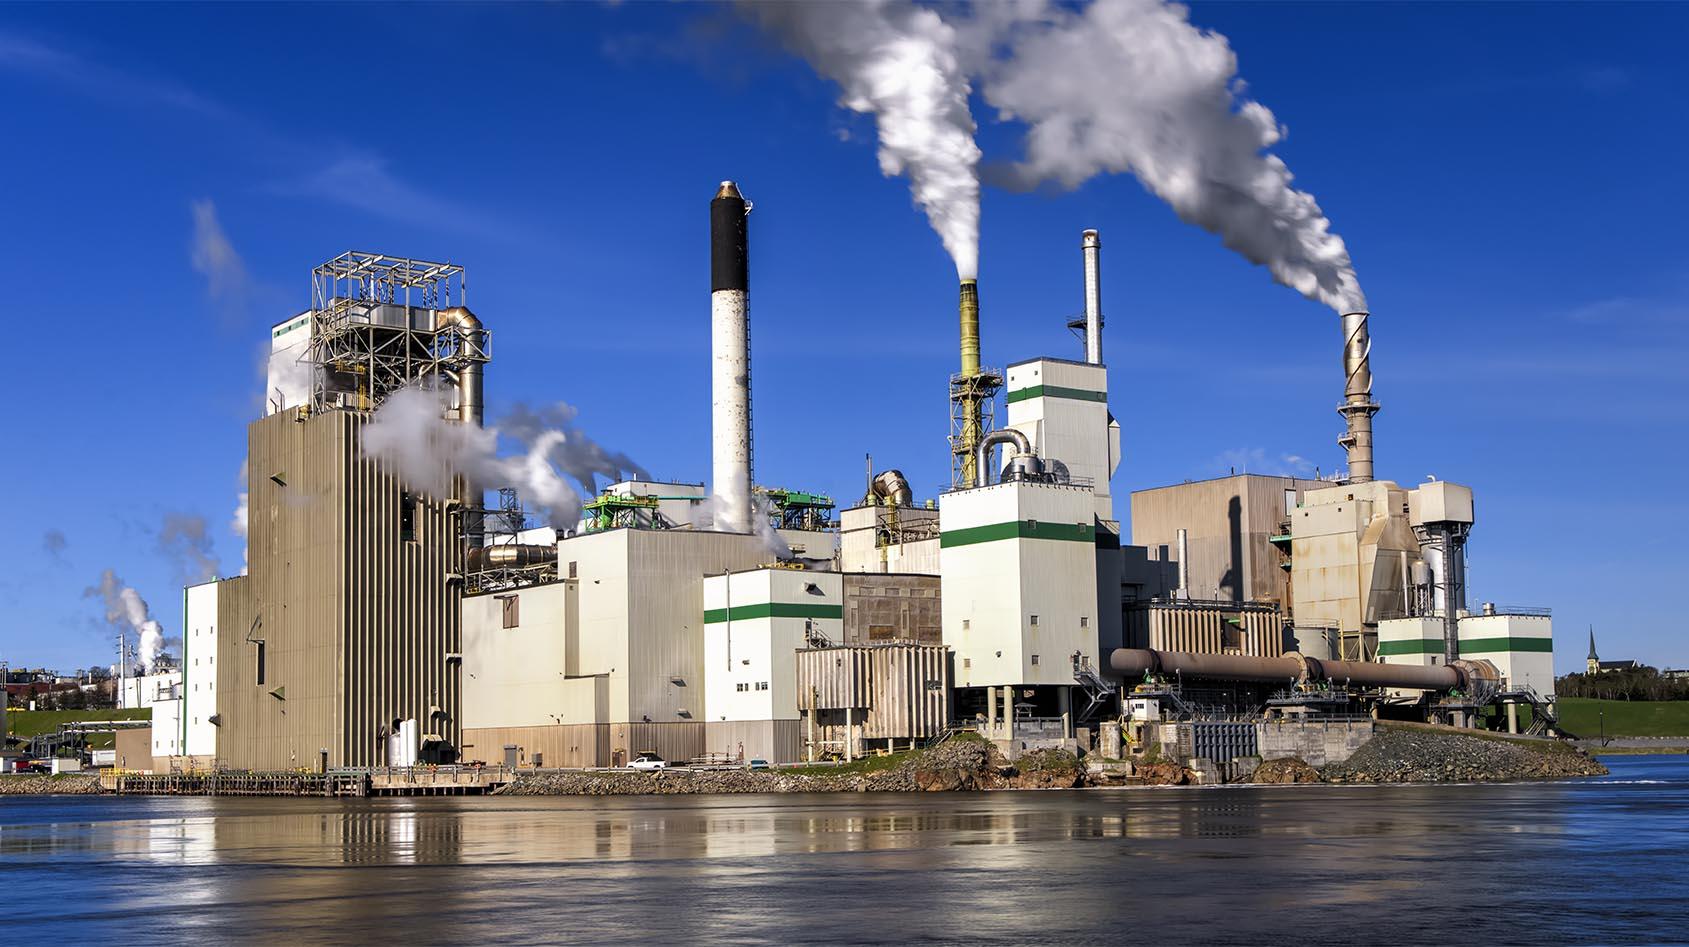 HeatMatrix paper industrial factory emitting flue gases